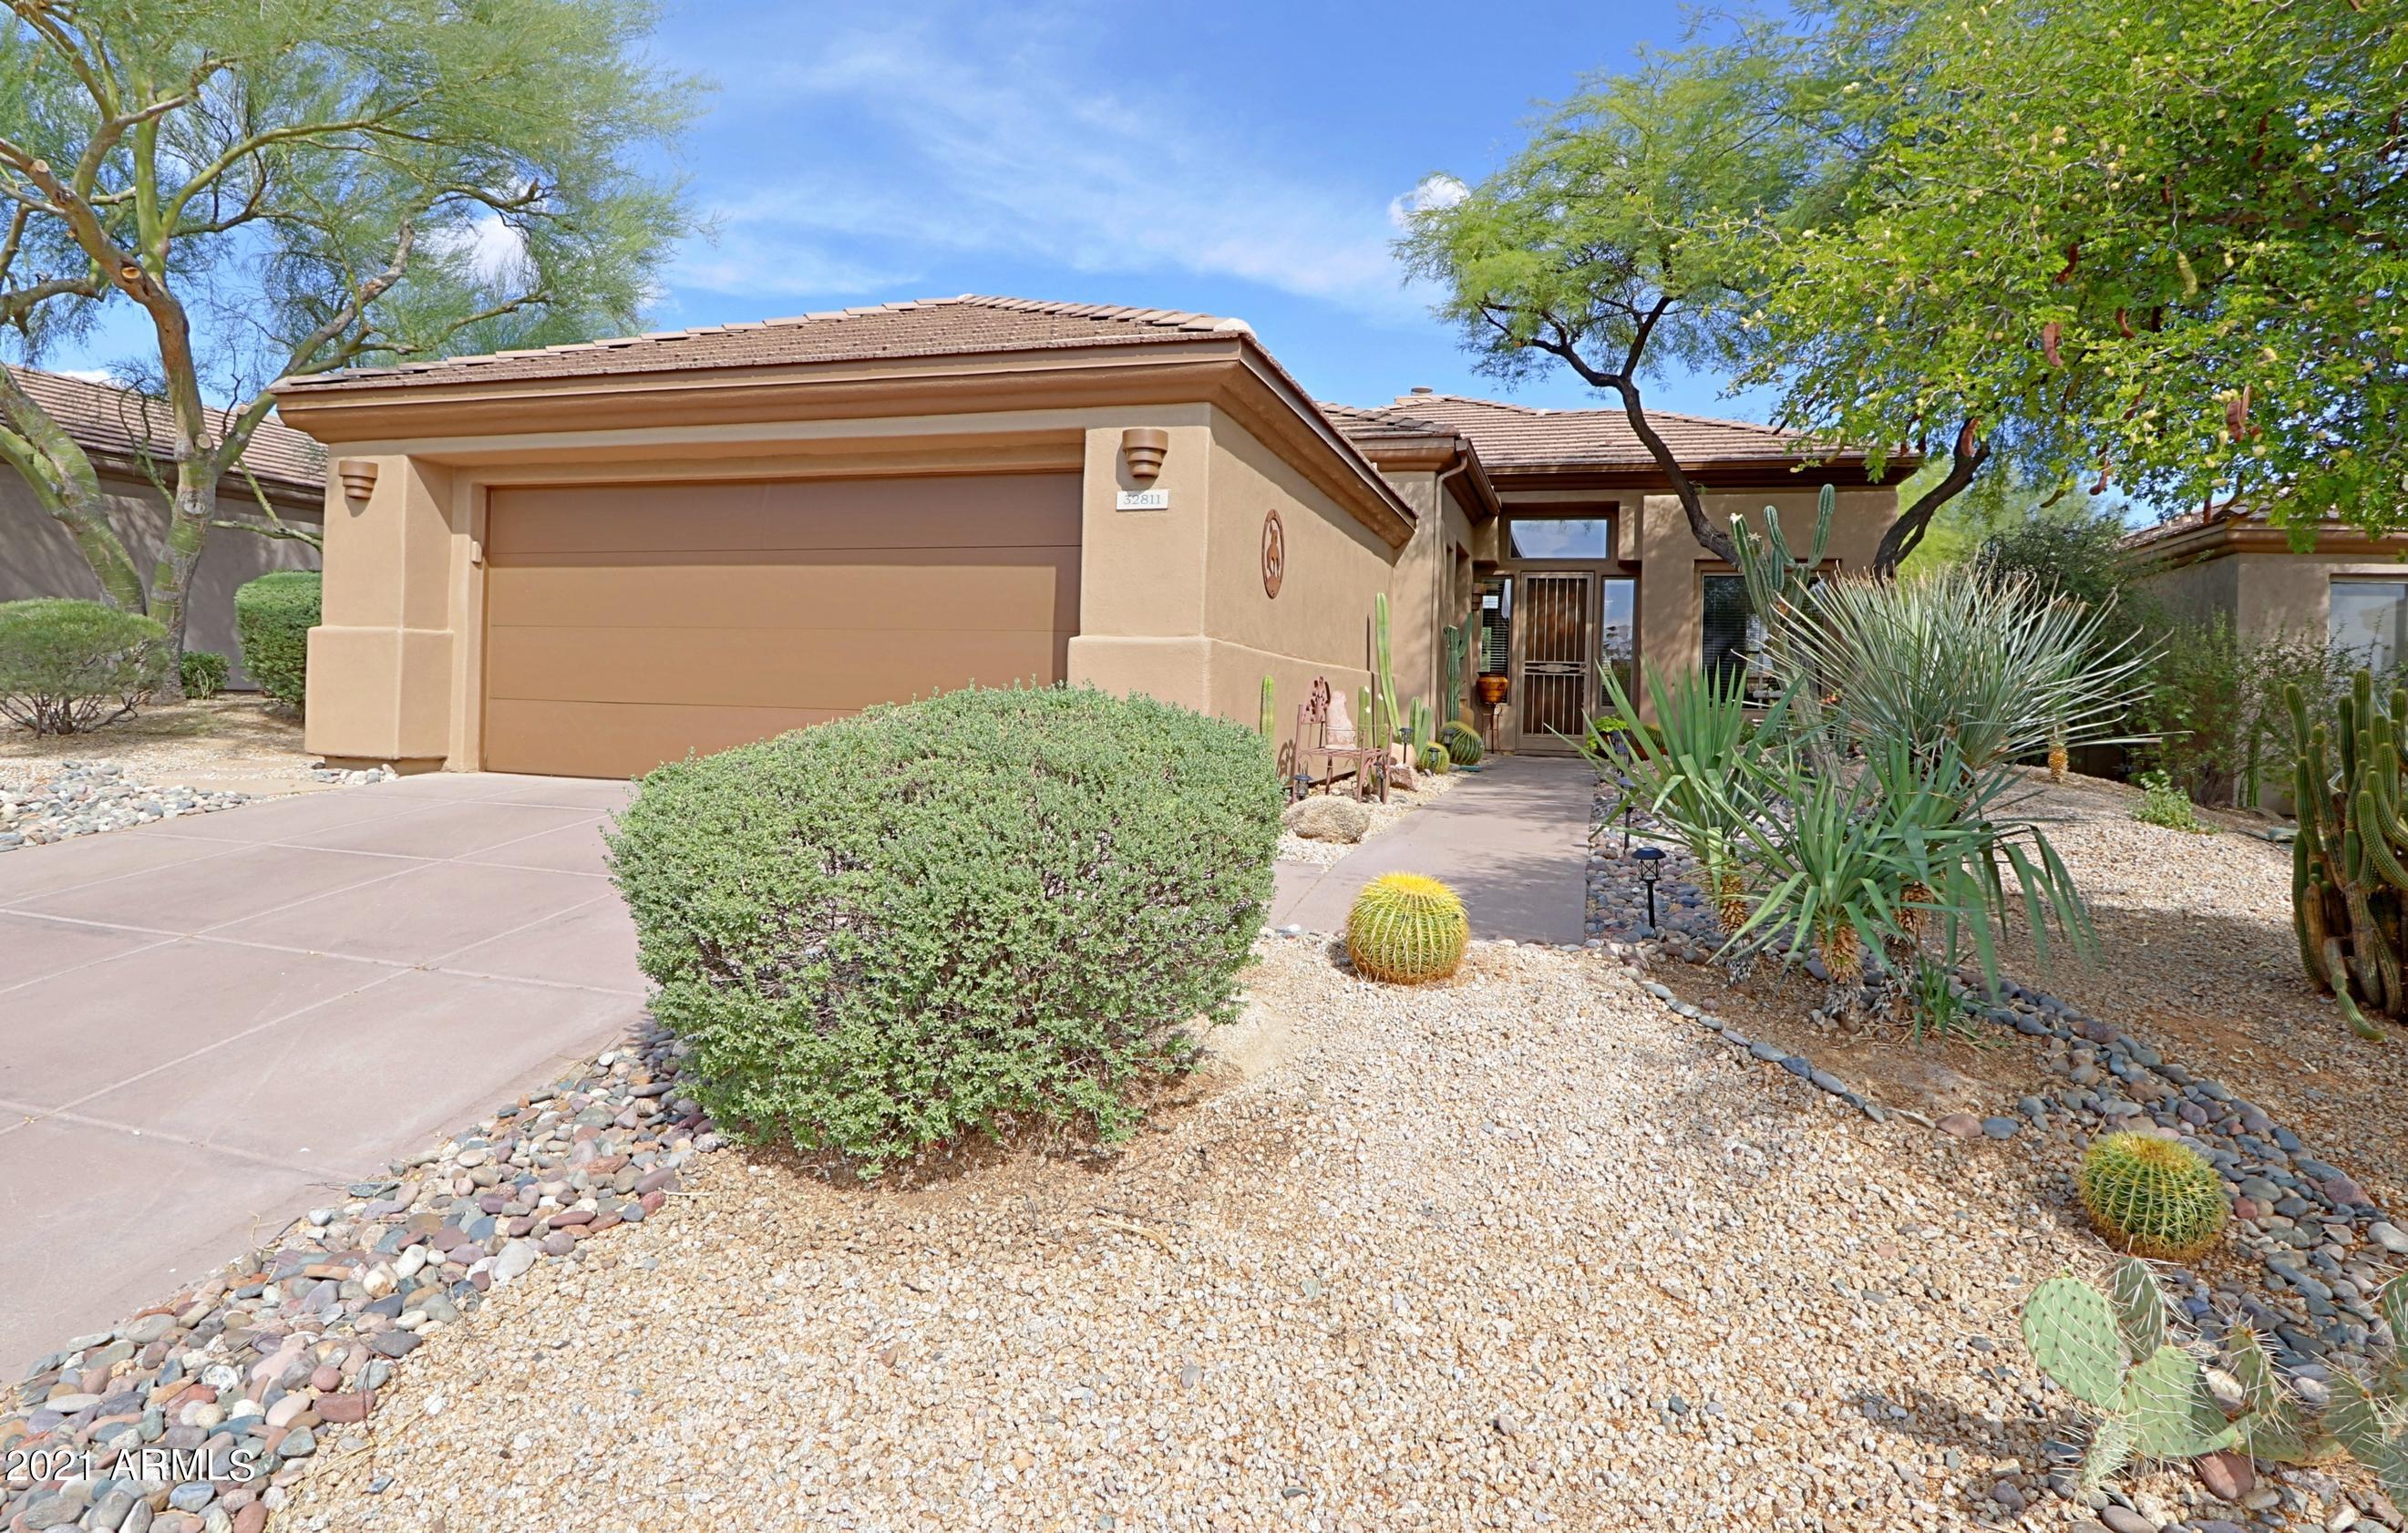 32811 N 70th Street, Scottsdale AZ 85266